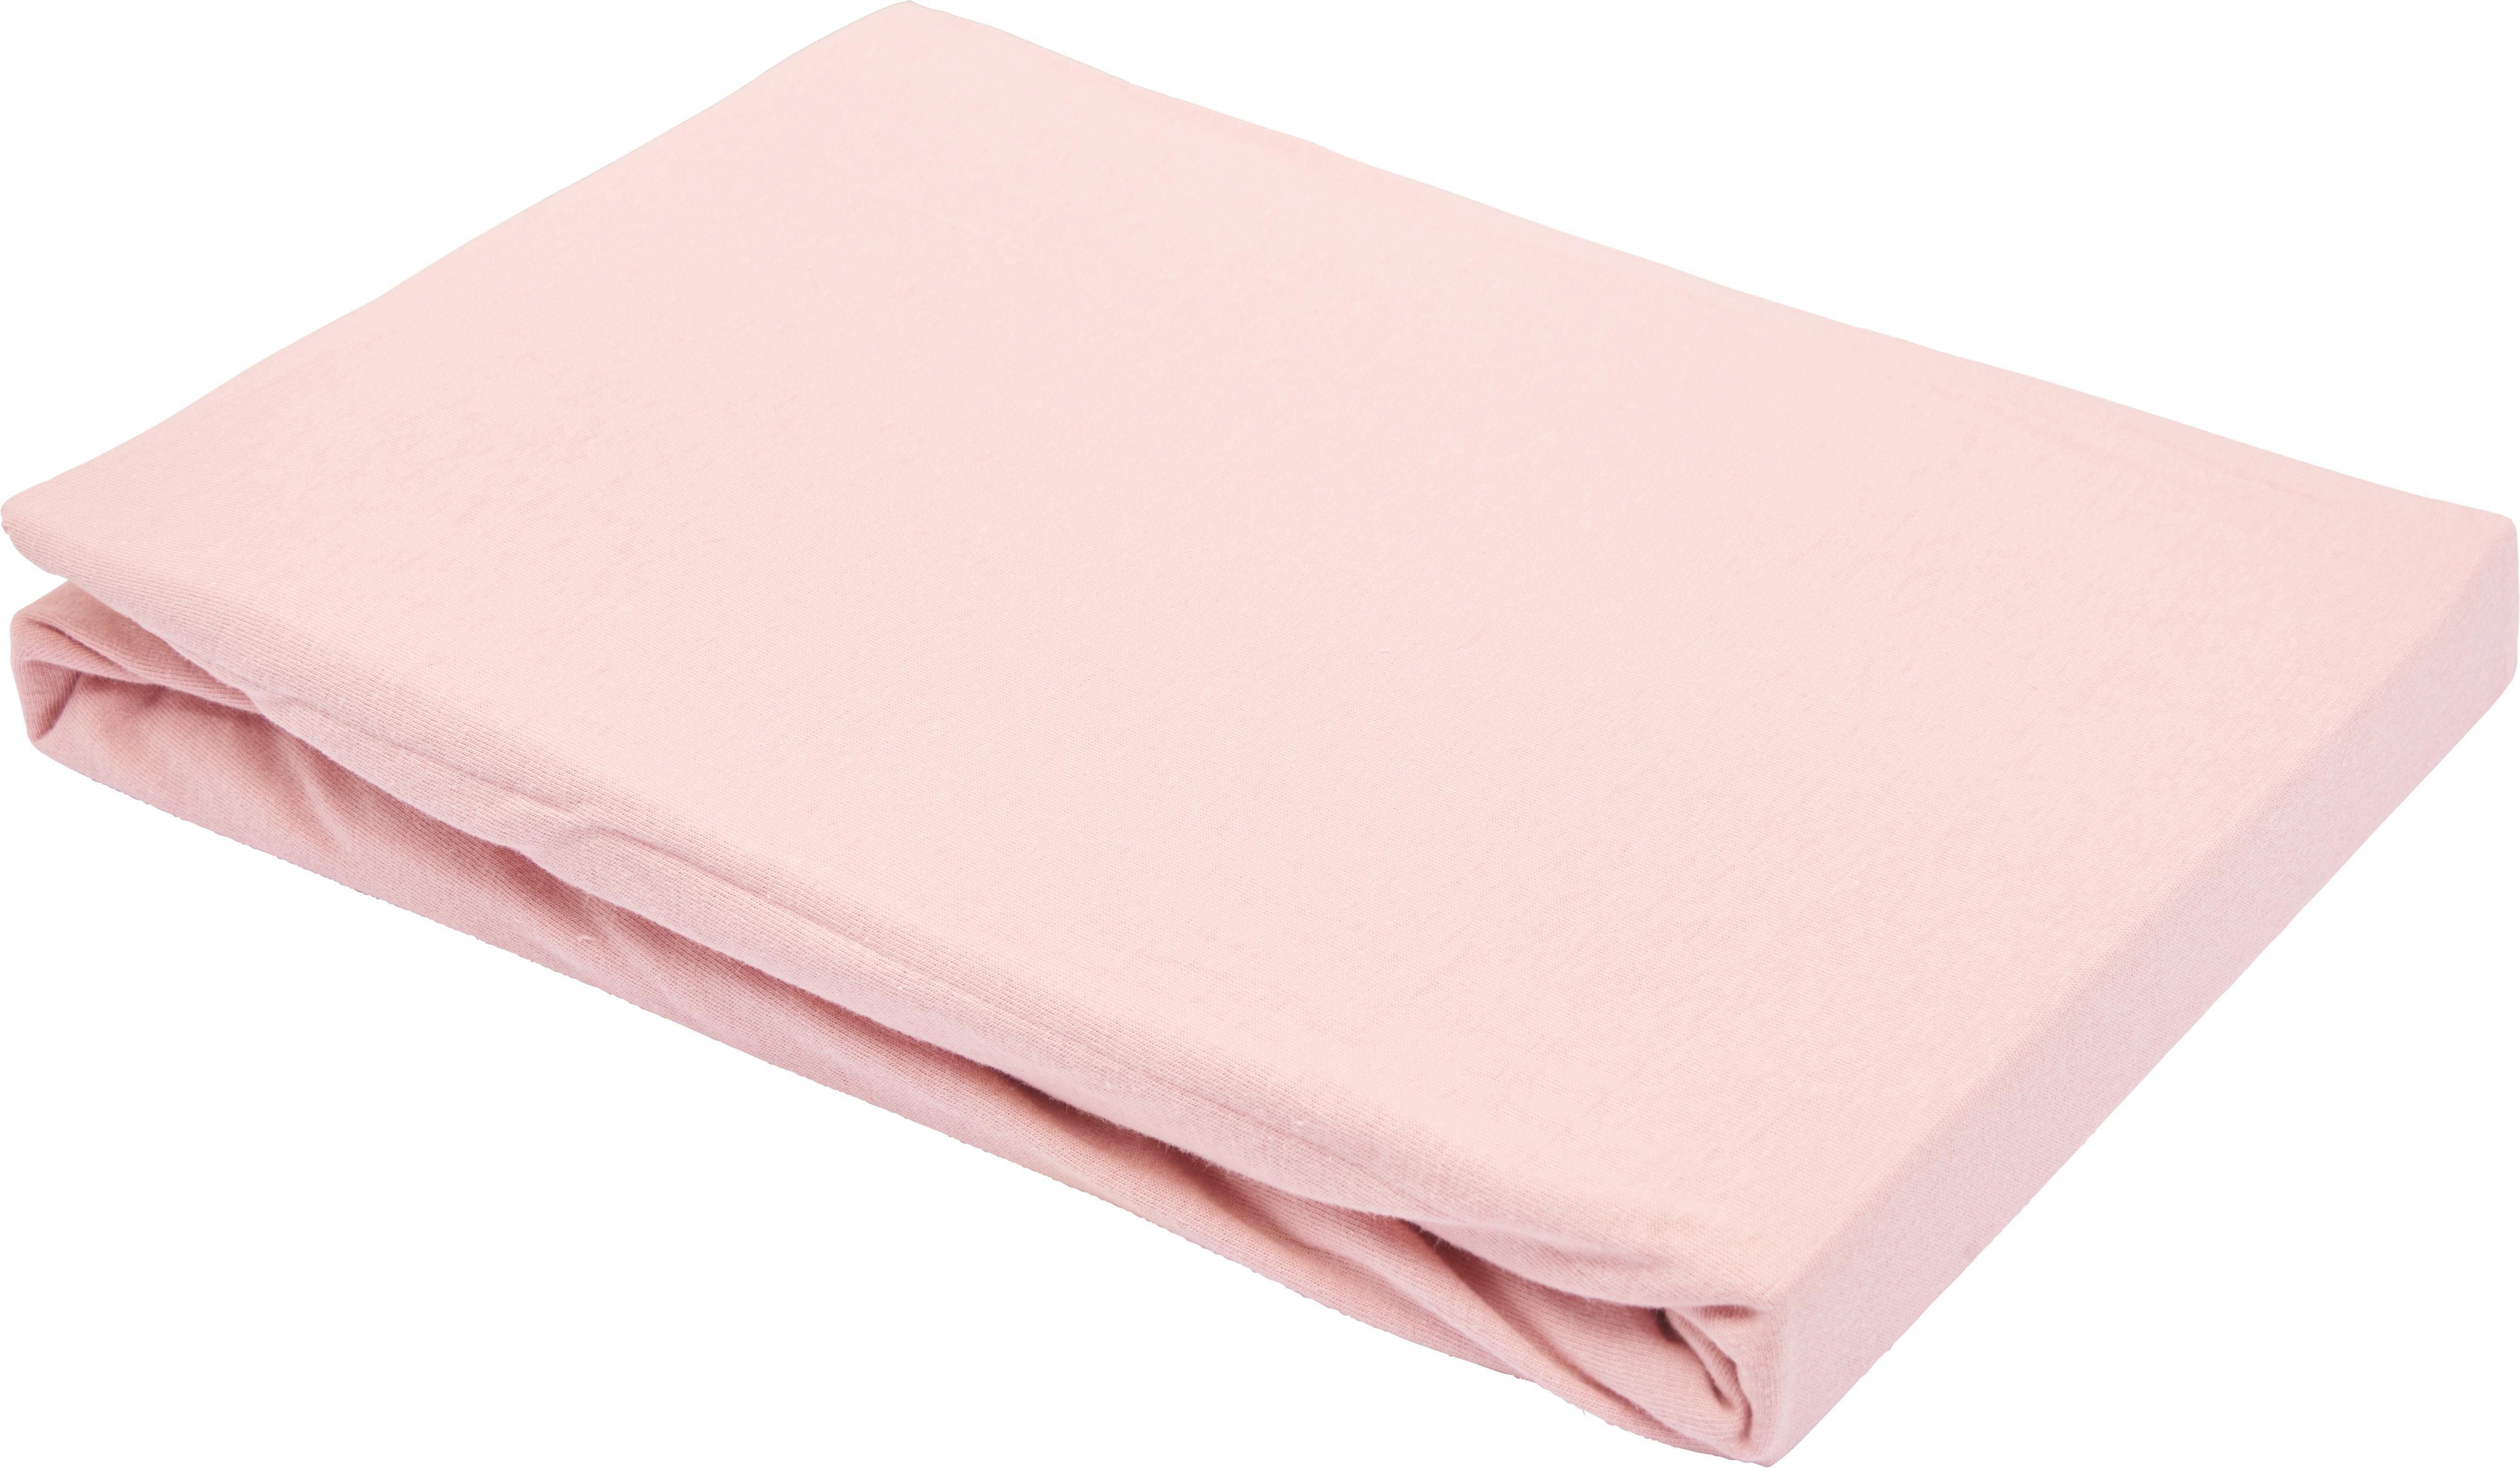 Spannbetttuch Basic in Rosa, ca. 100x200cm - Rosa, Textil (100/200cm) - MÖMAX modern living